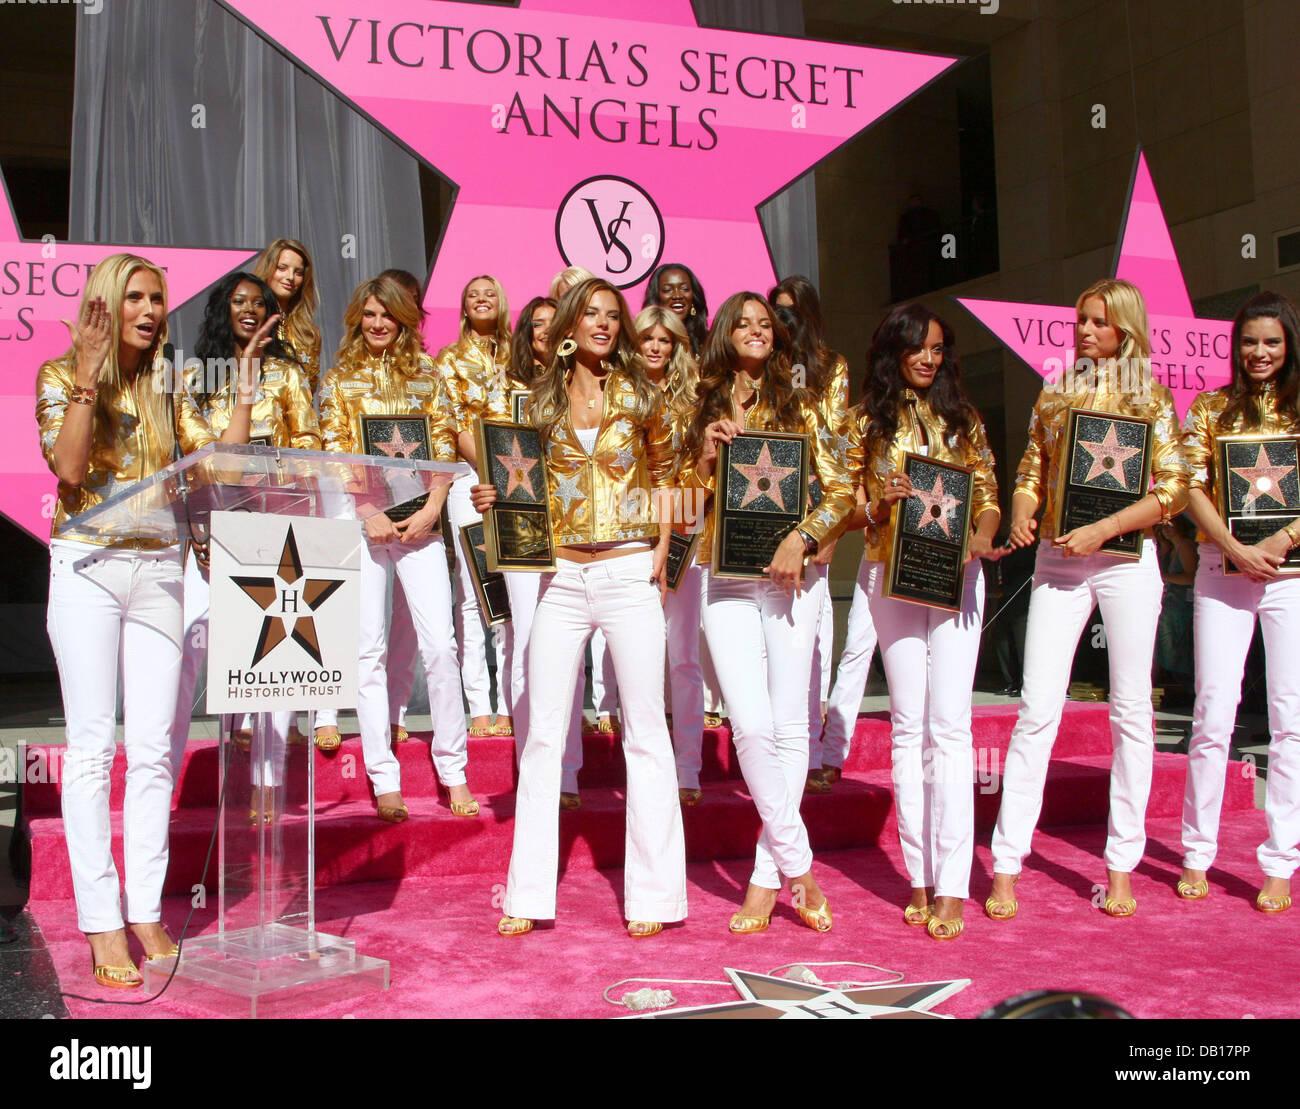 Tyra Banks Promotes New Book With Her Bra On Show: Victoria Secret Stock Photos & Victoria Secret Stock